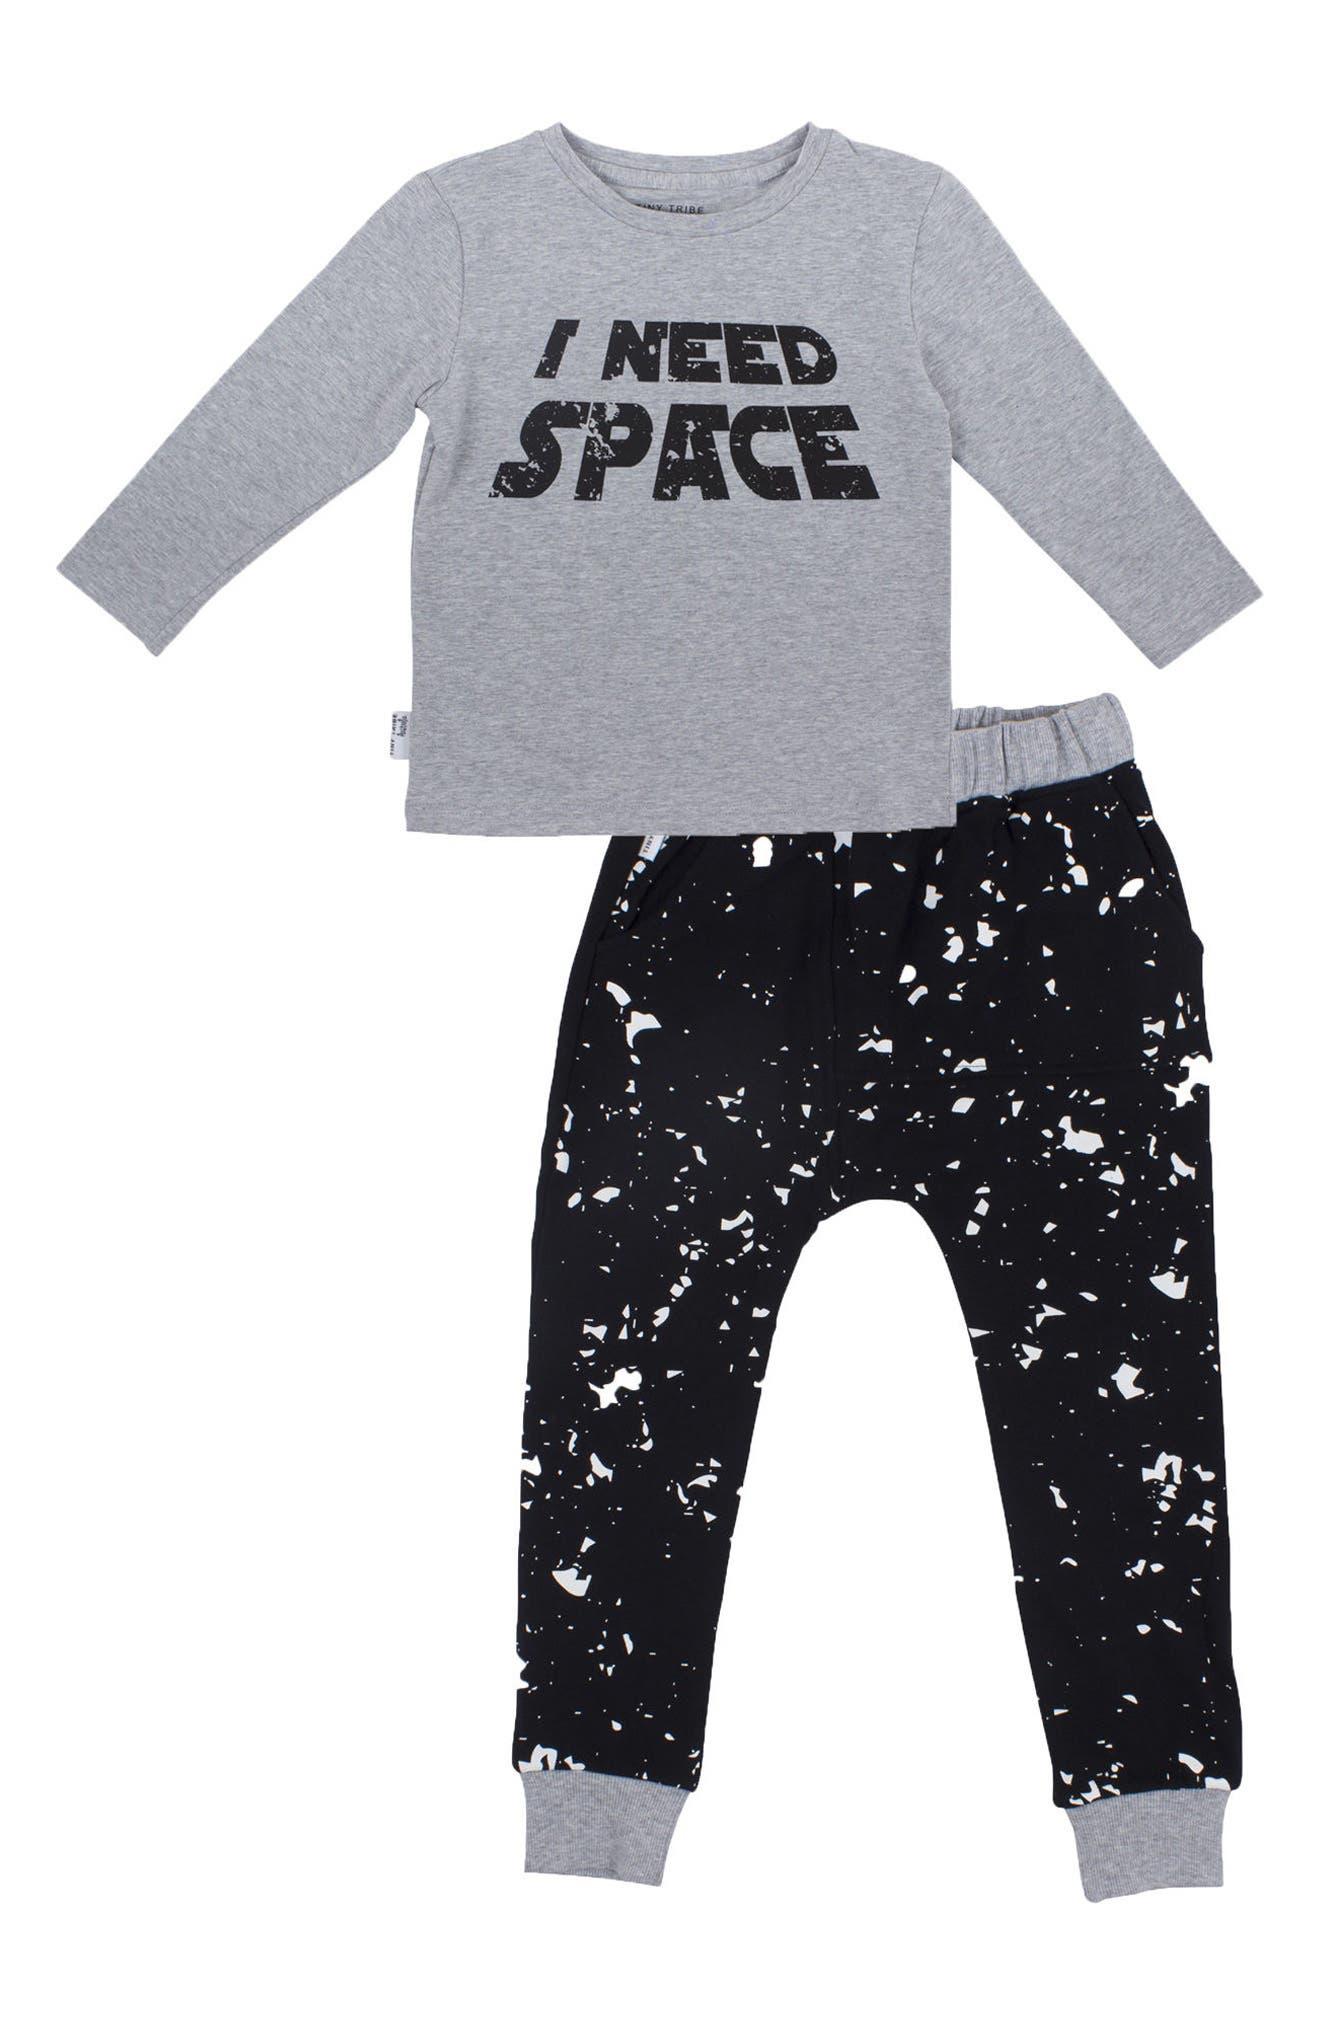 Tiny Tribe I Need Space T-Shirt & Sweatpants Set (Baby & Toddler)